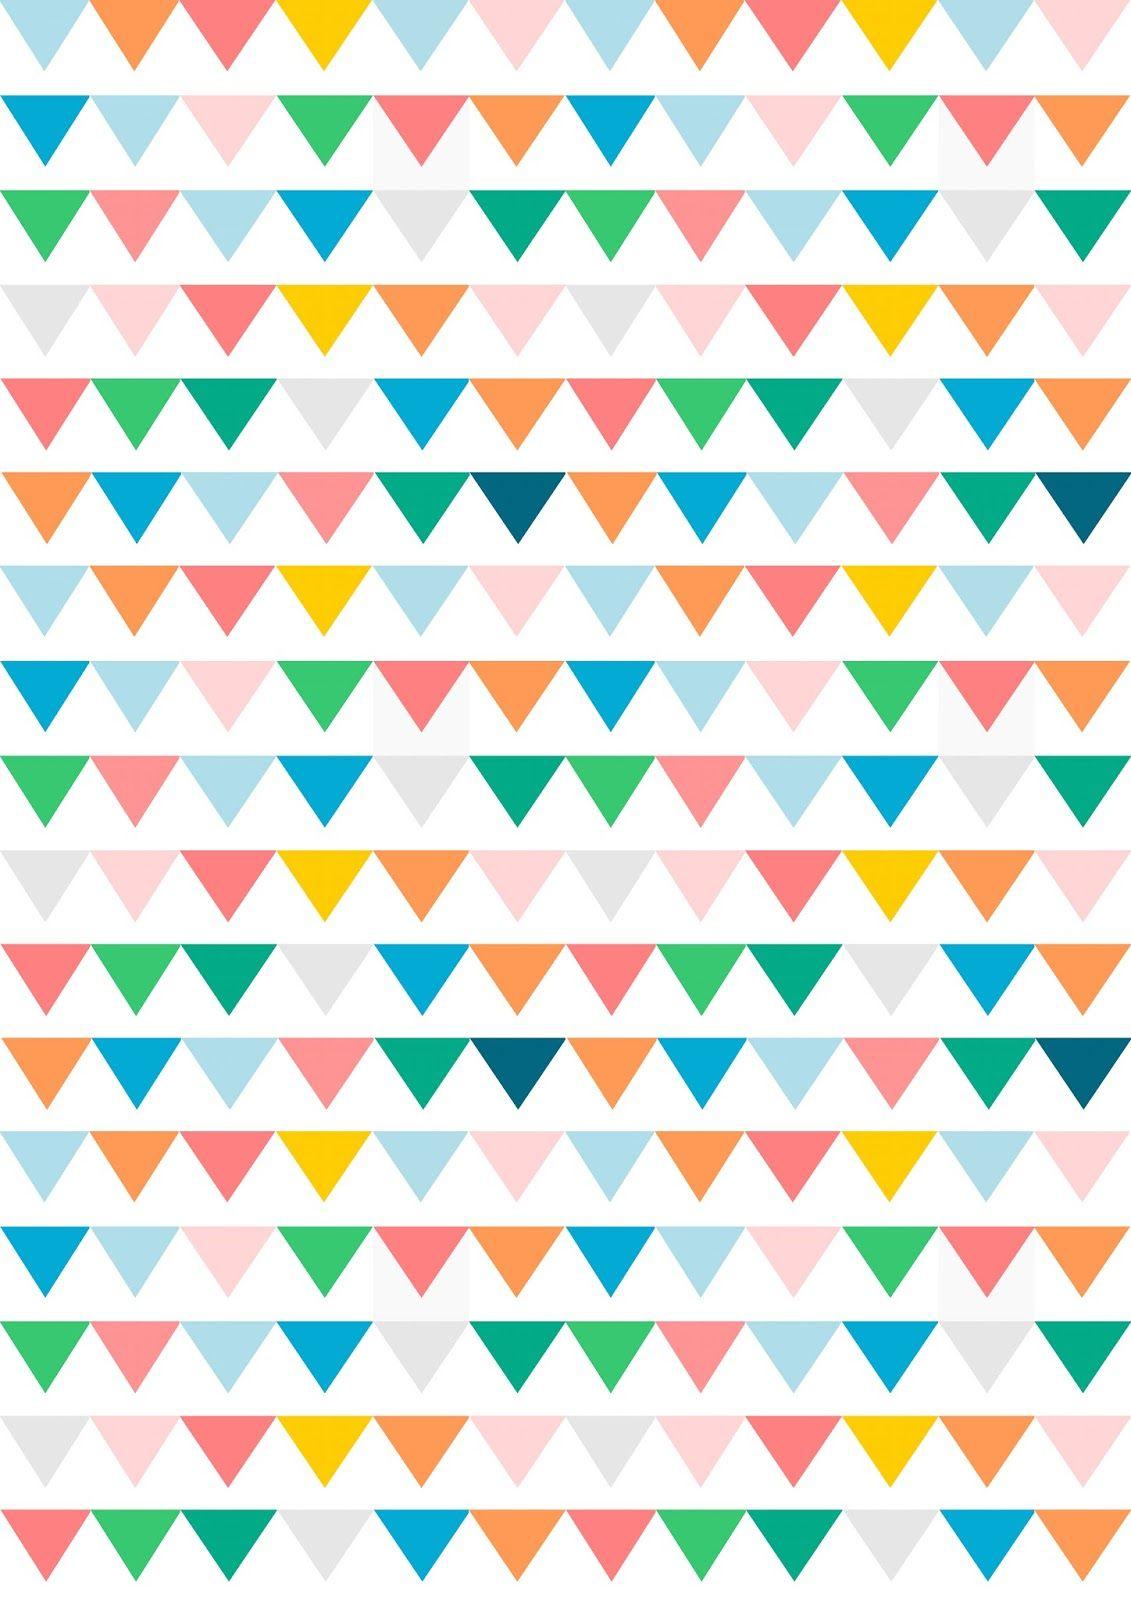 Free Digital Bunting Scrapbooking Paper - Ausdruckbares - Free Printable Scrapbook Paper Designs